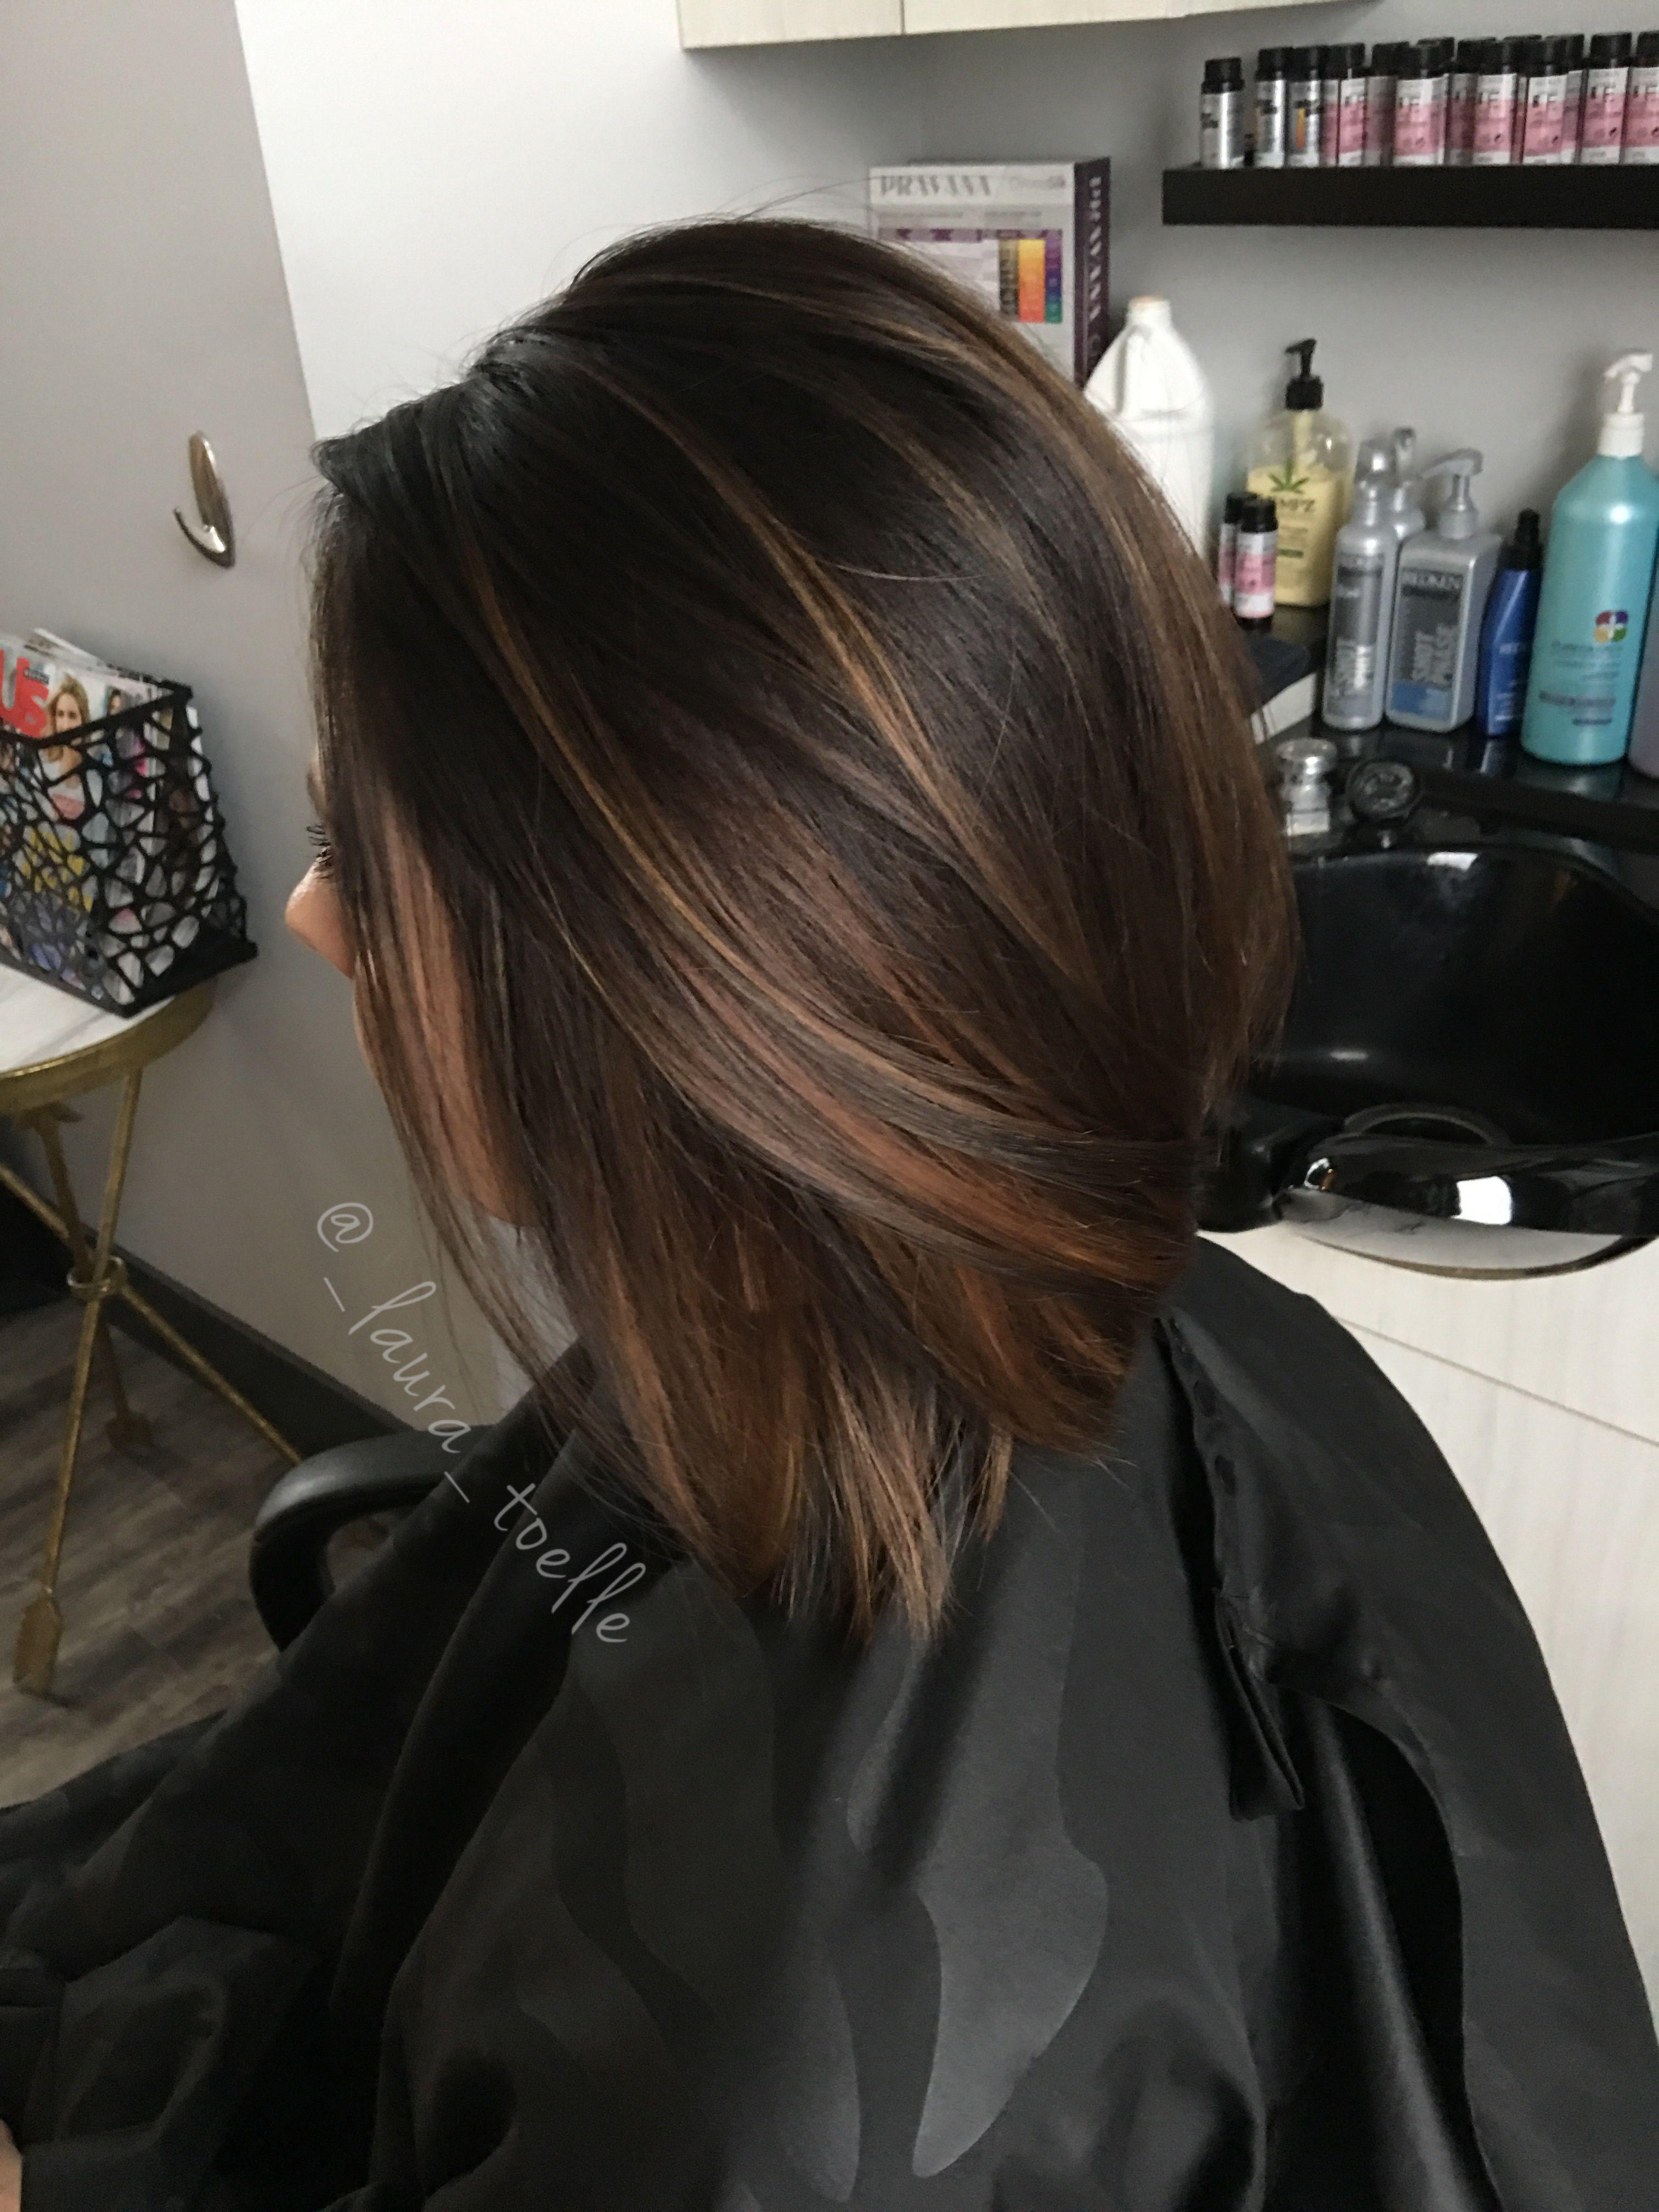 Caramel Highlights Dark Brown Hair Lkhairstudios In 2020 Hair Styles Brown Hair With Highlights Highlights For Dark Brown Hair